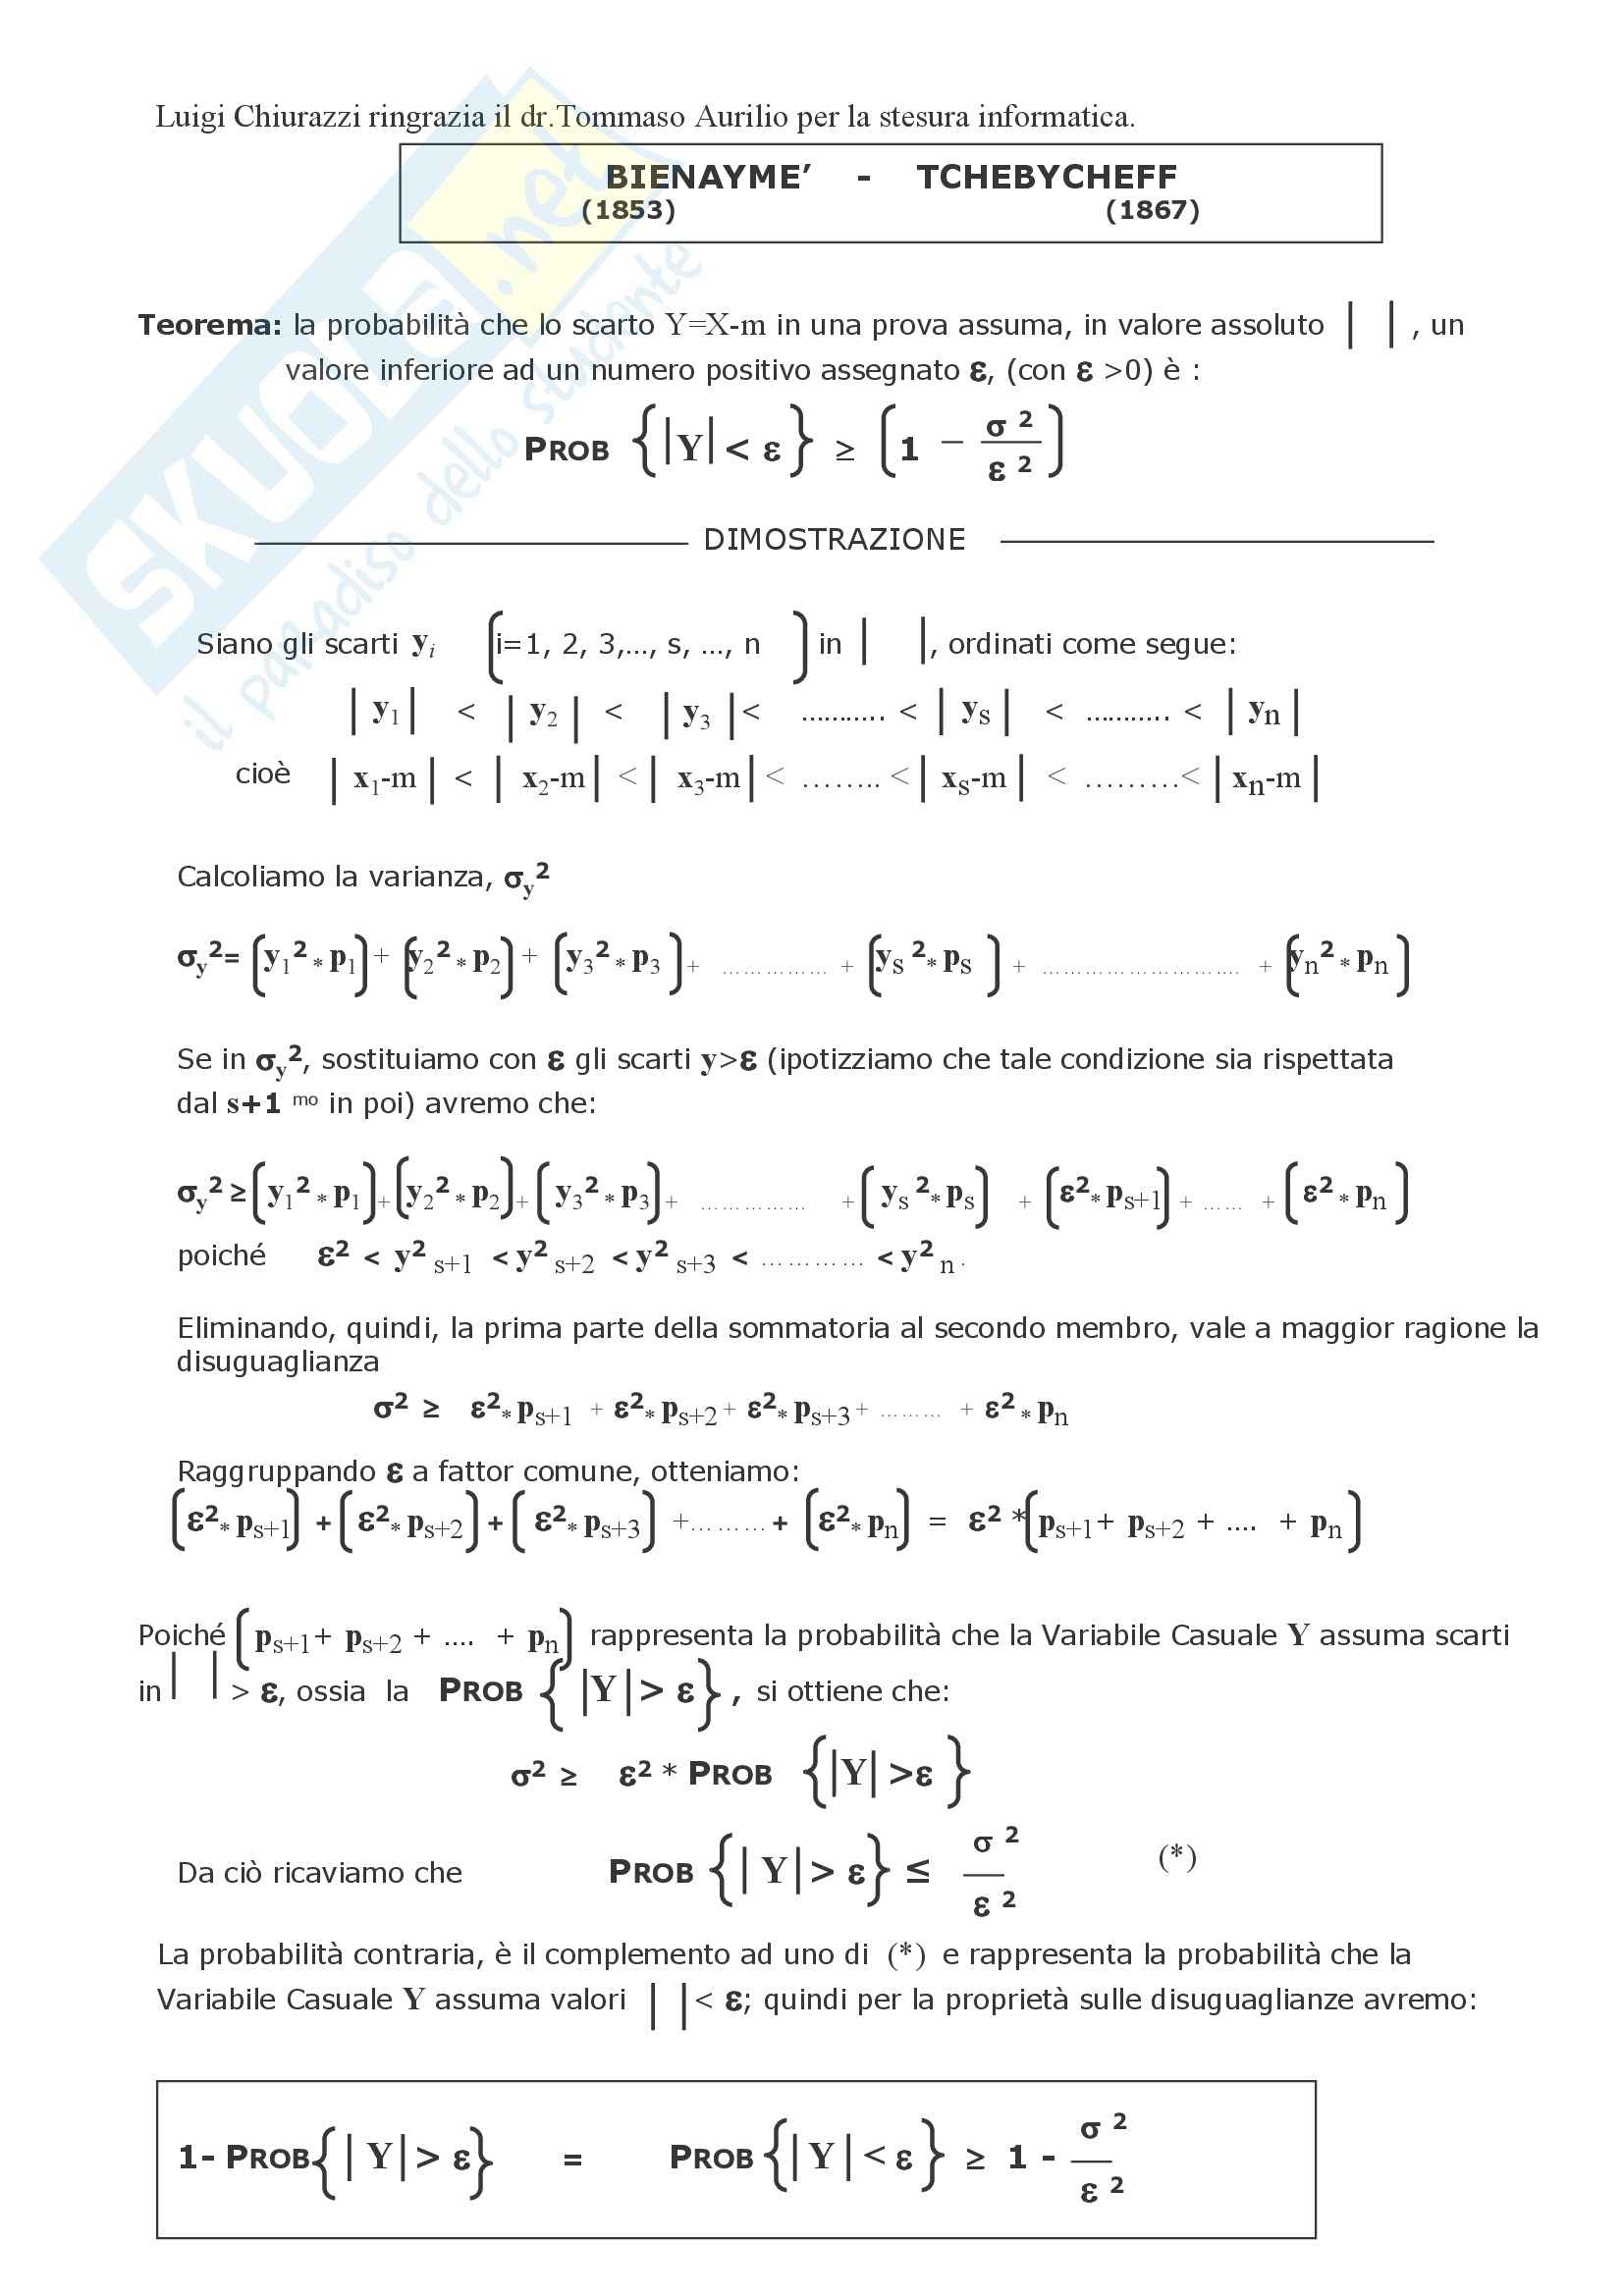 Matematica finanziaria - teorema di Bienayme e Tchebycheff